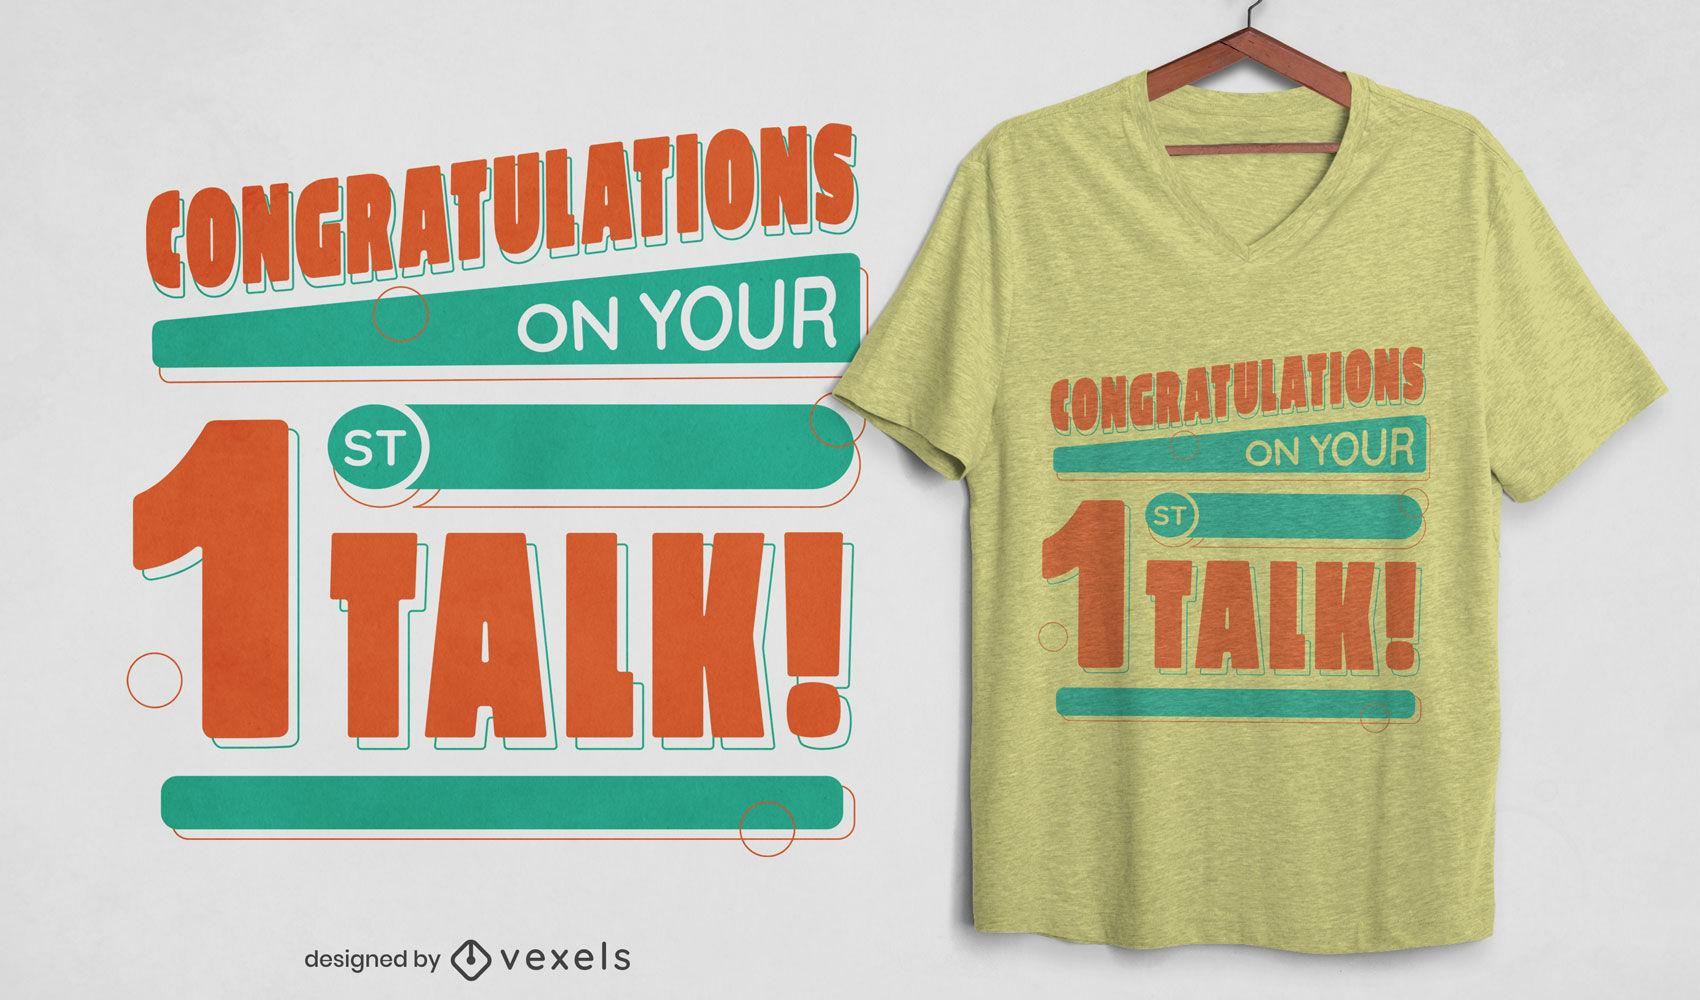 Herzlichen Glückwunsch zitieren T-Shirt-Design